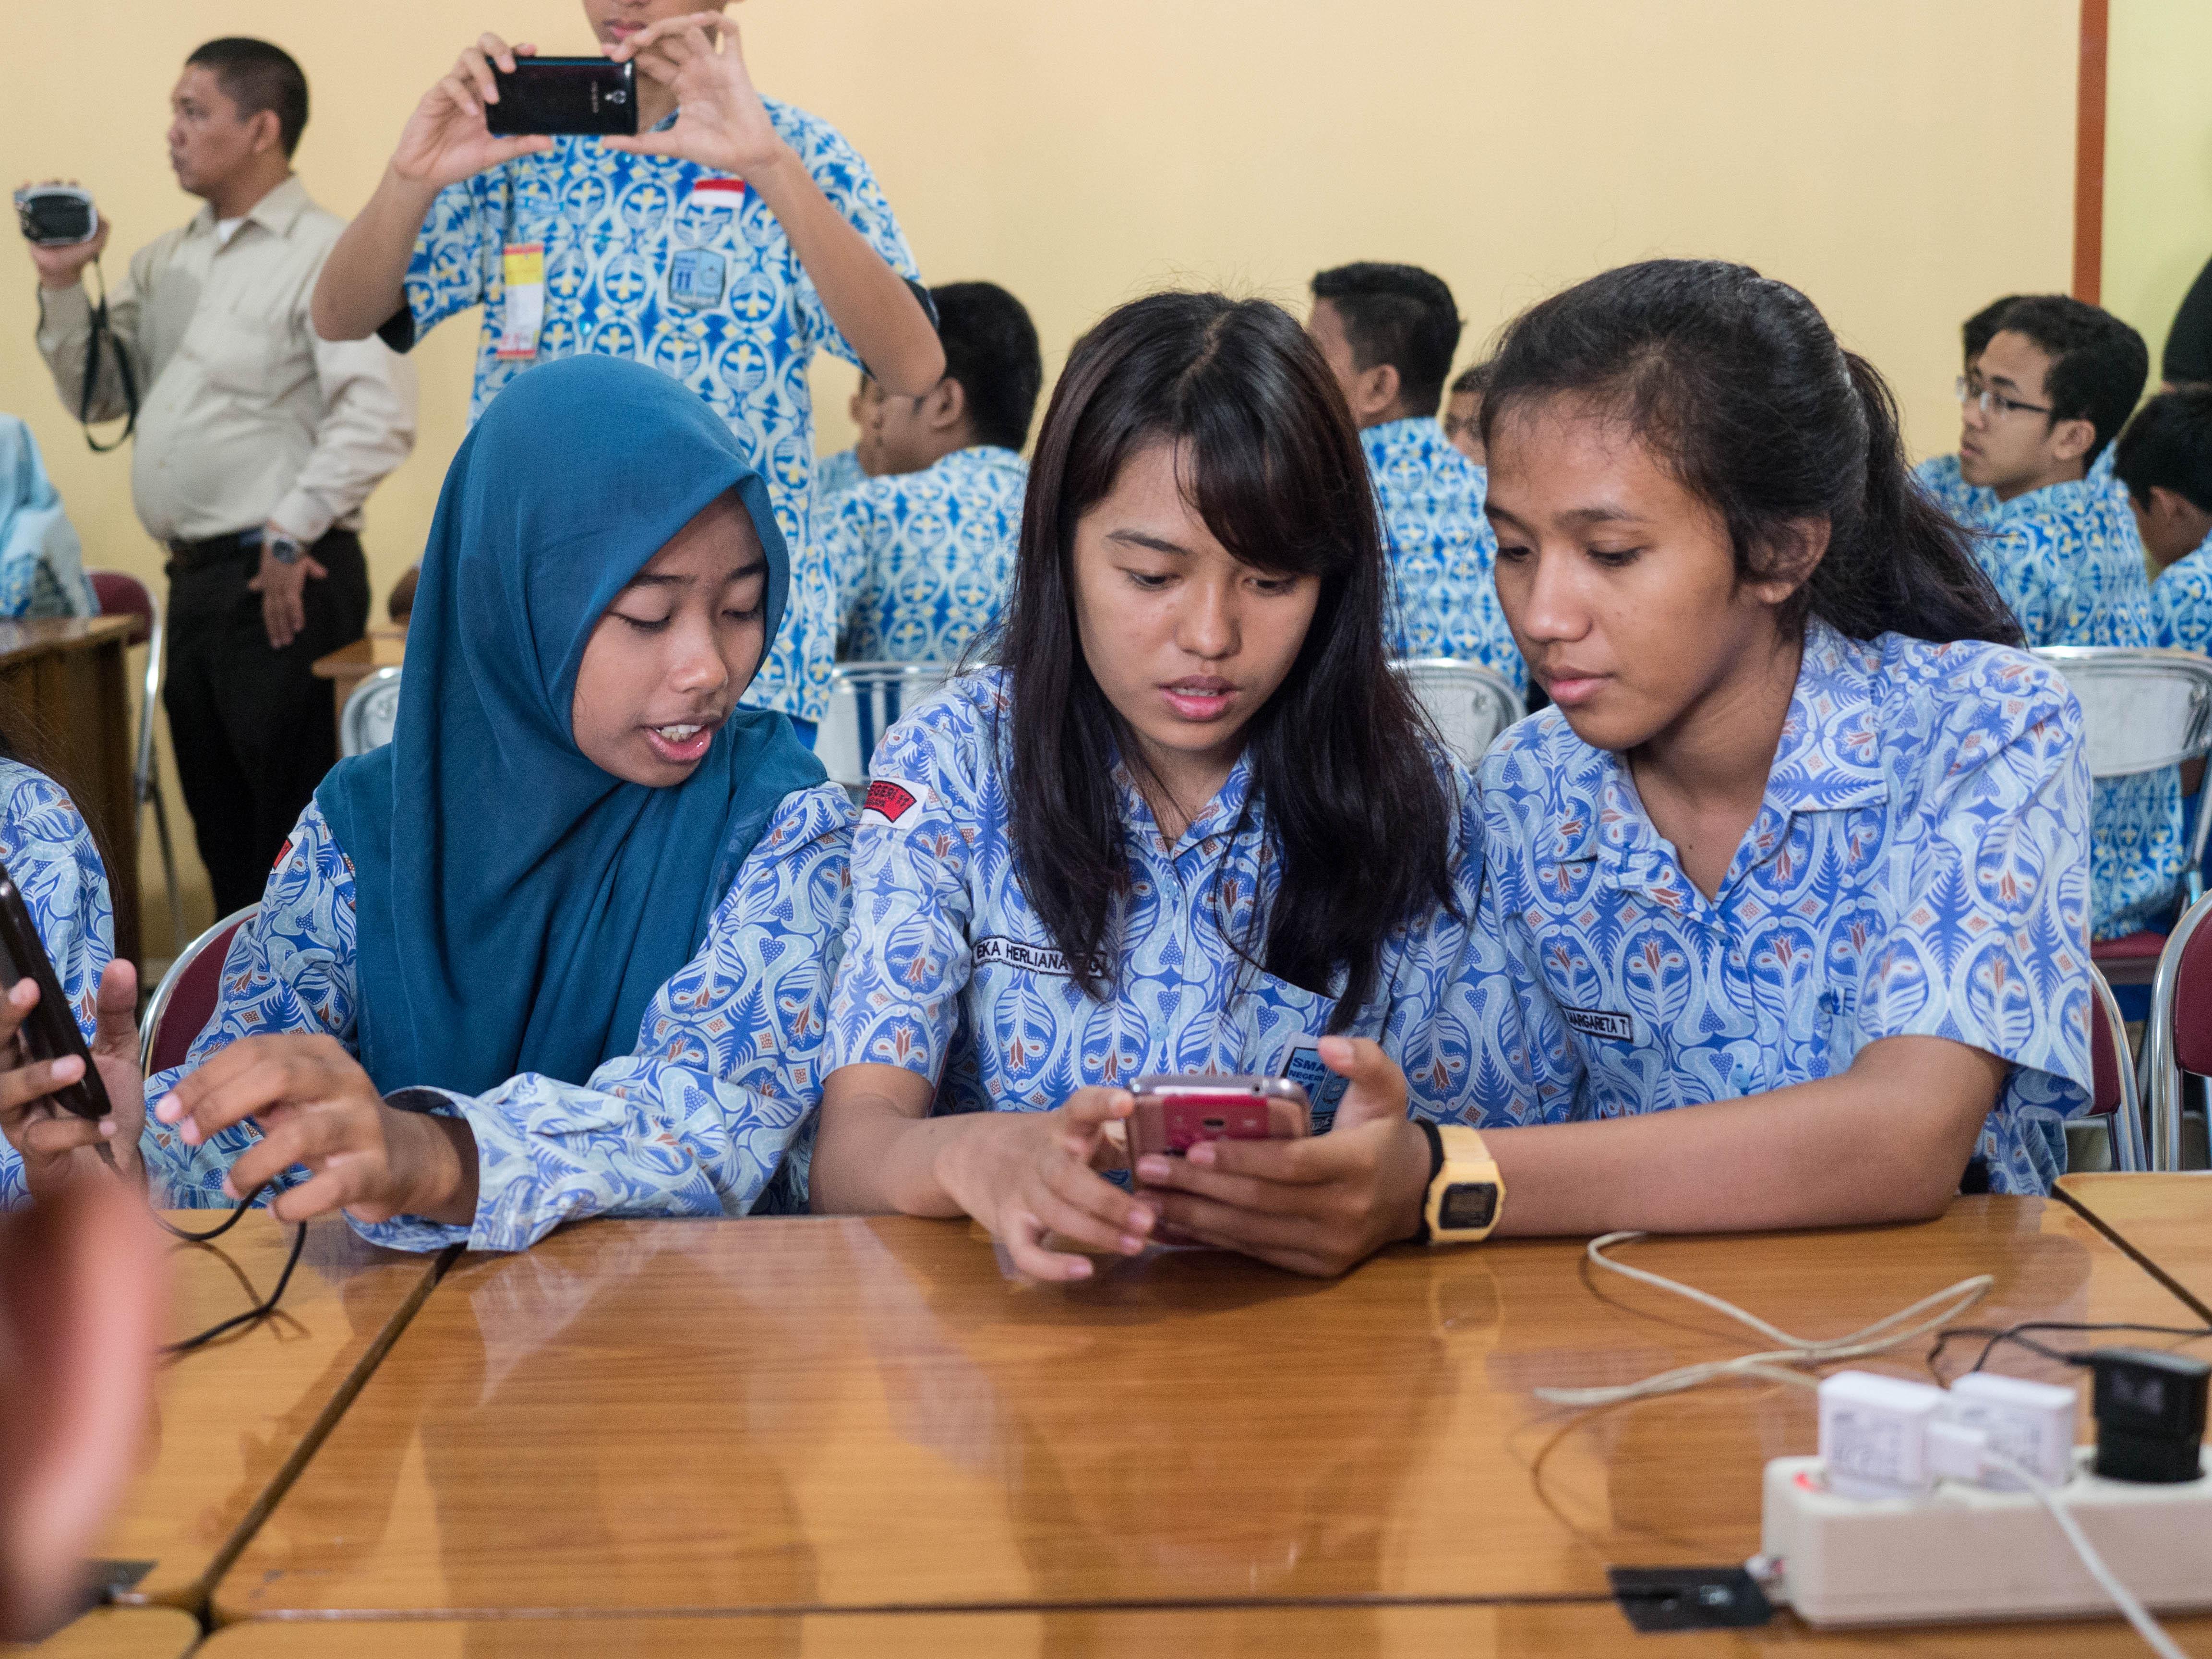 Mozilla Foundation Webmaker Program, Indonesia (credit: Laura de Reynal)